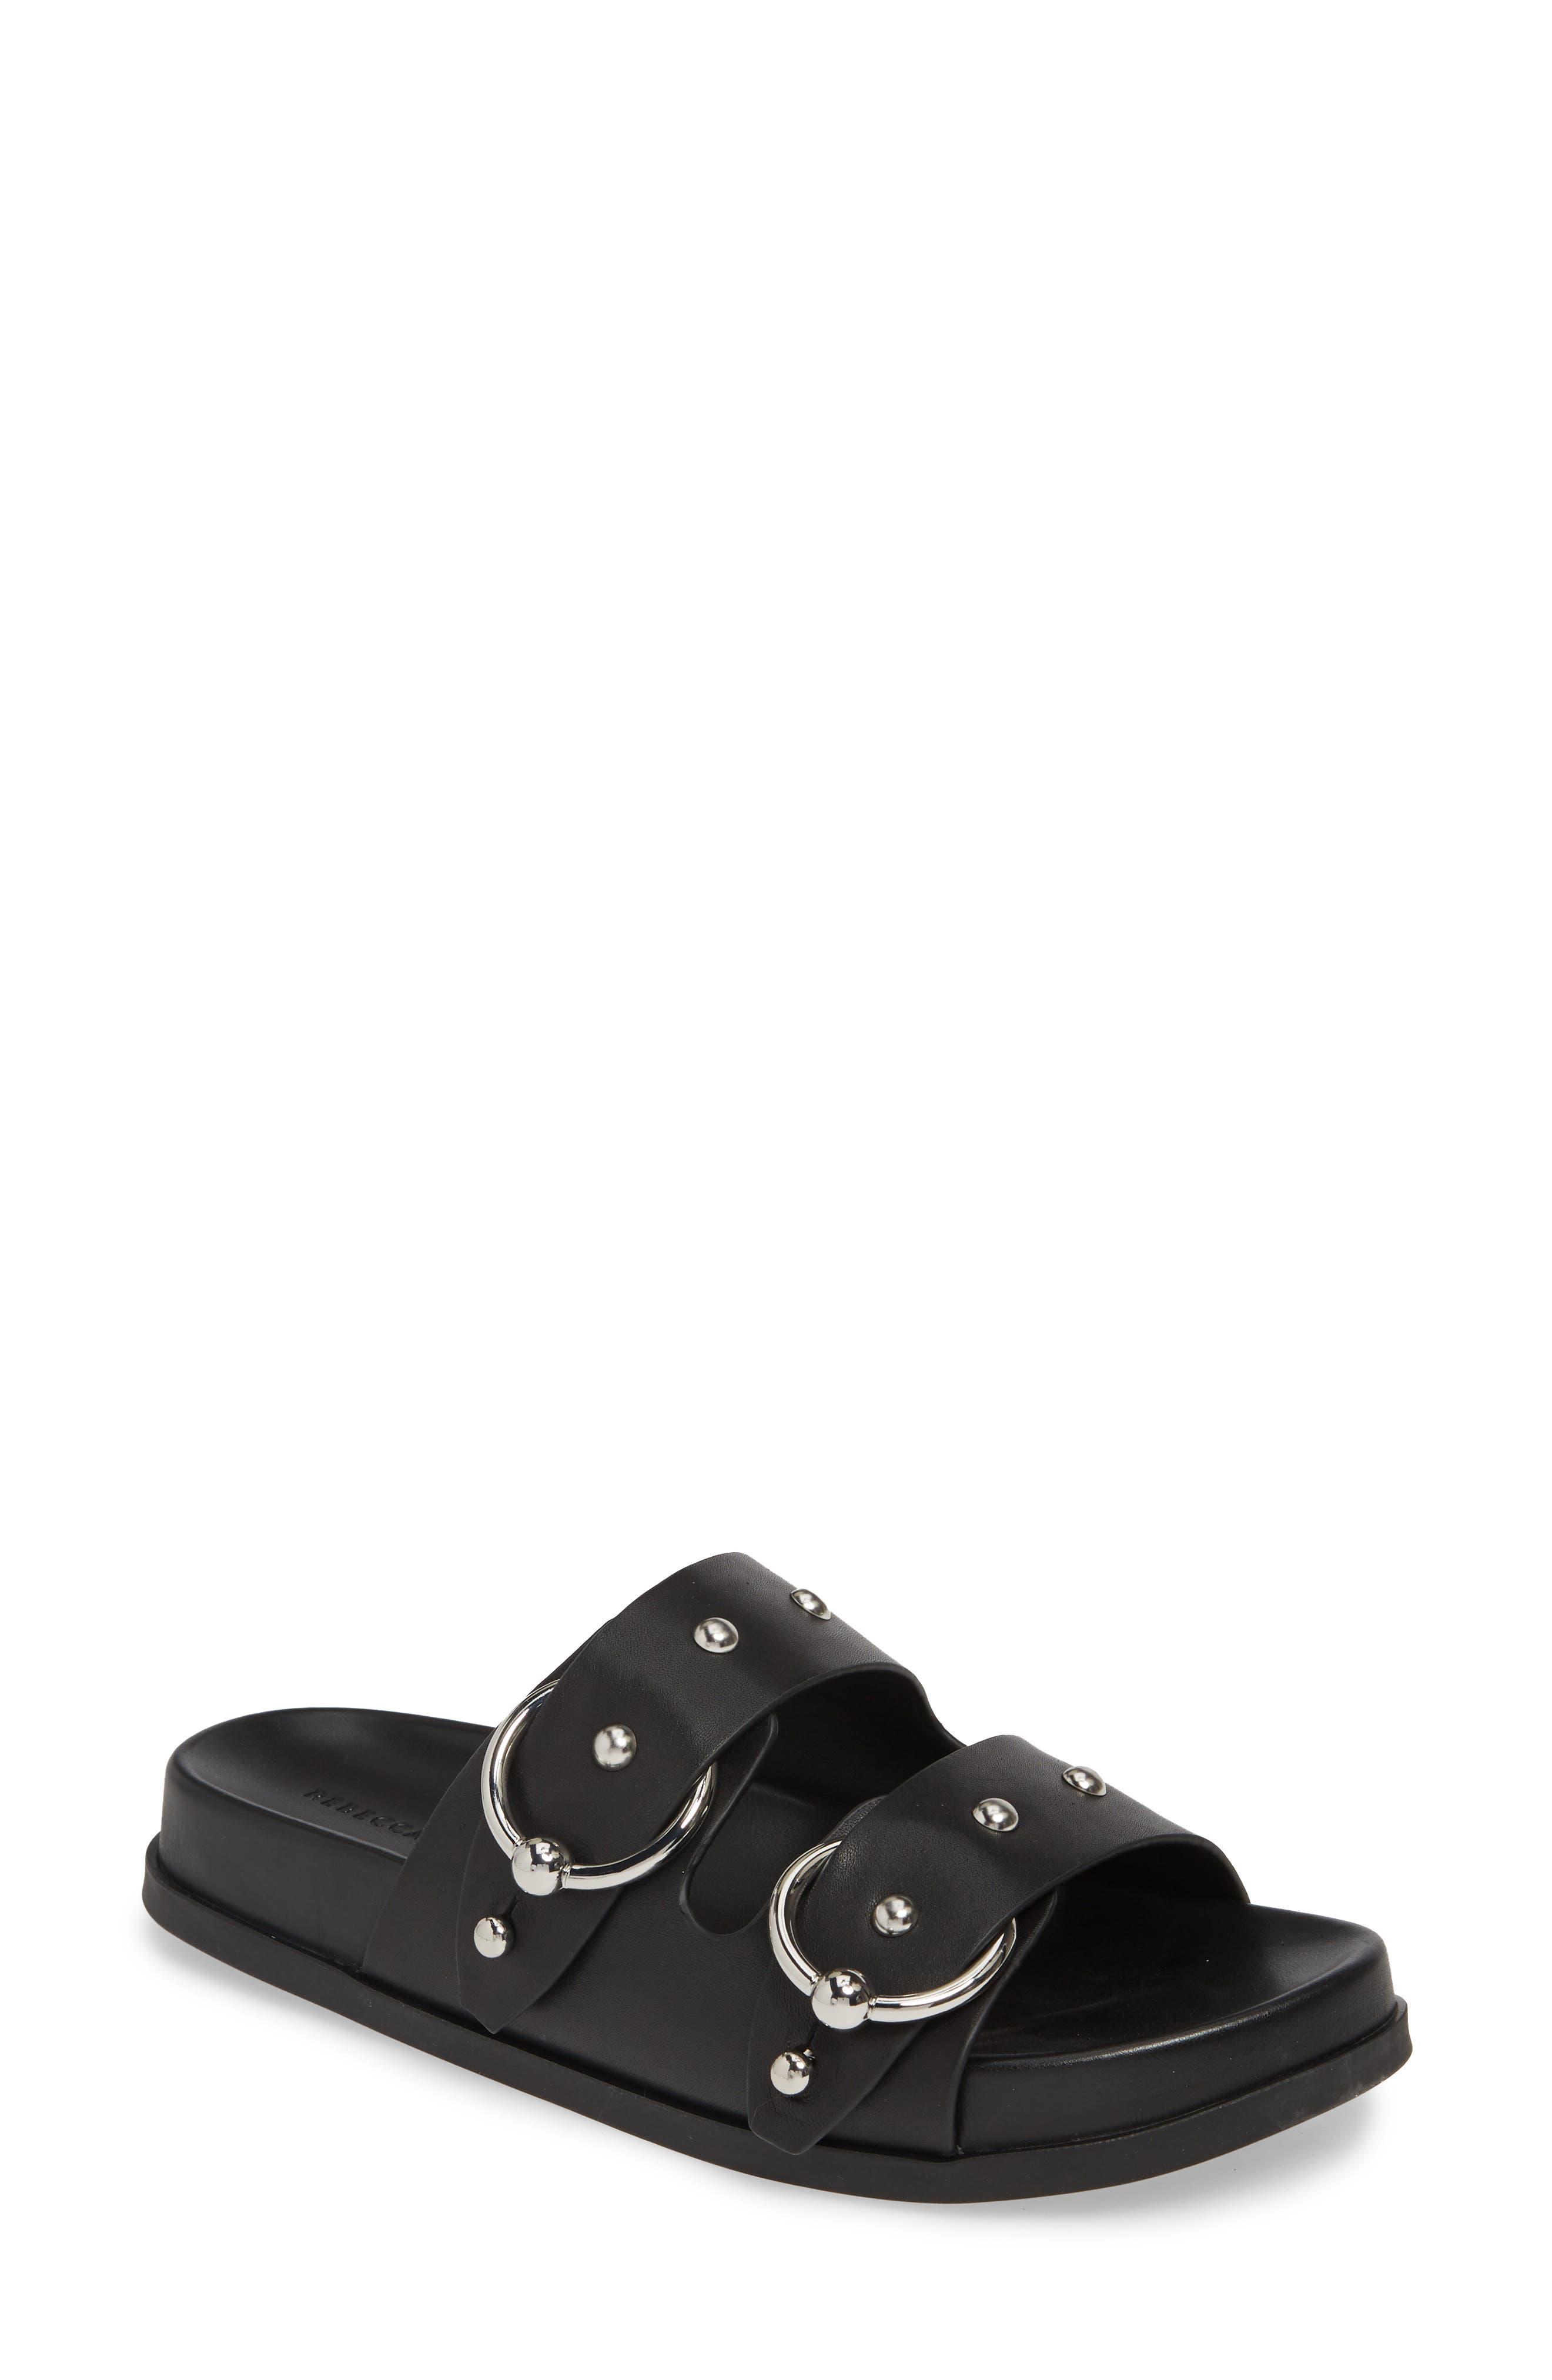 REBECCA MINKOFF, Vachel Slide Sandal, Main thumbnail 1, color, BLACK LEATHER